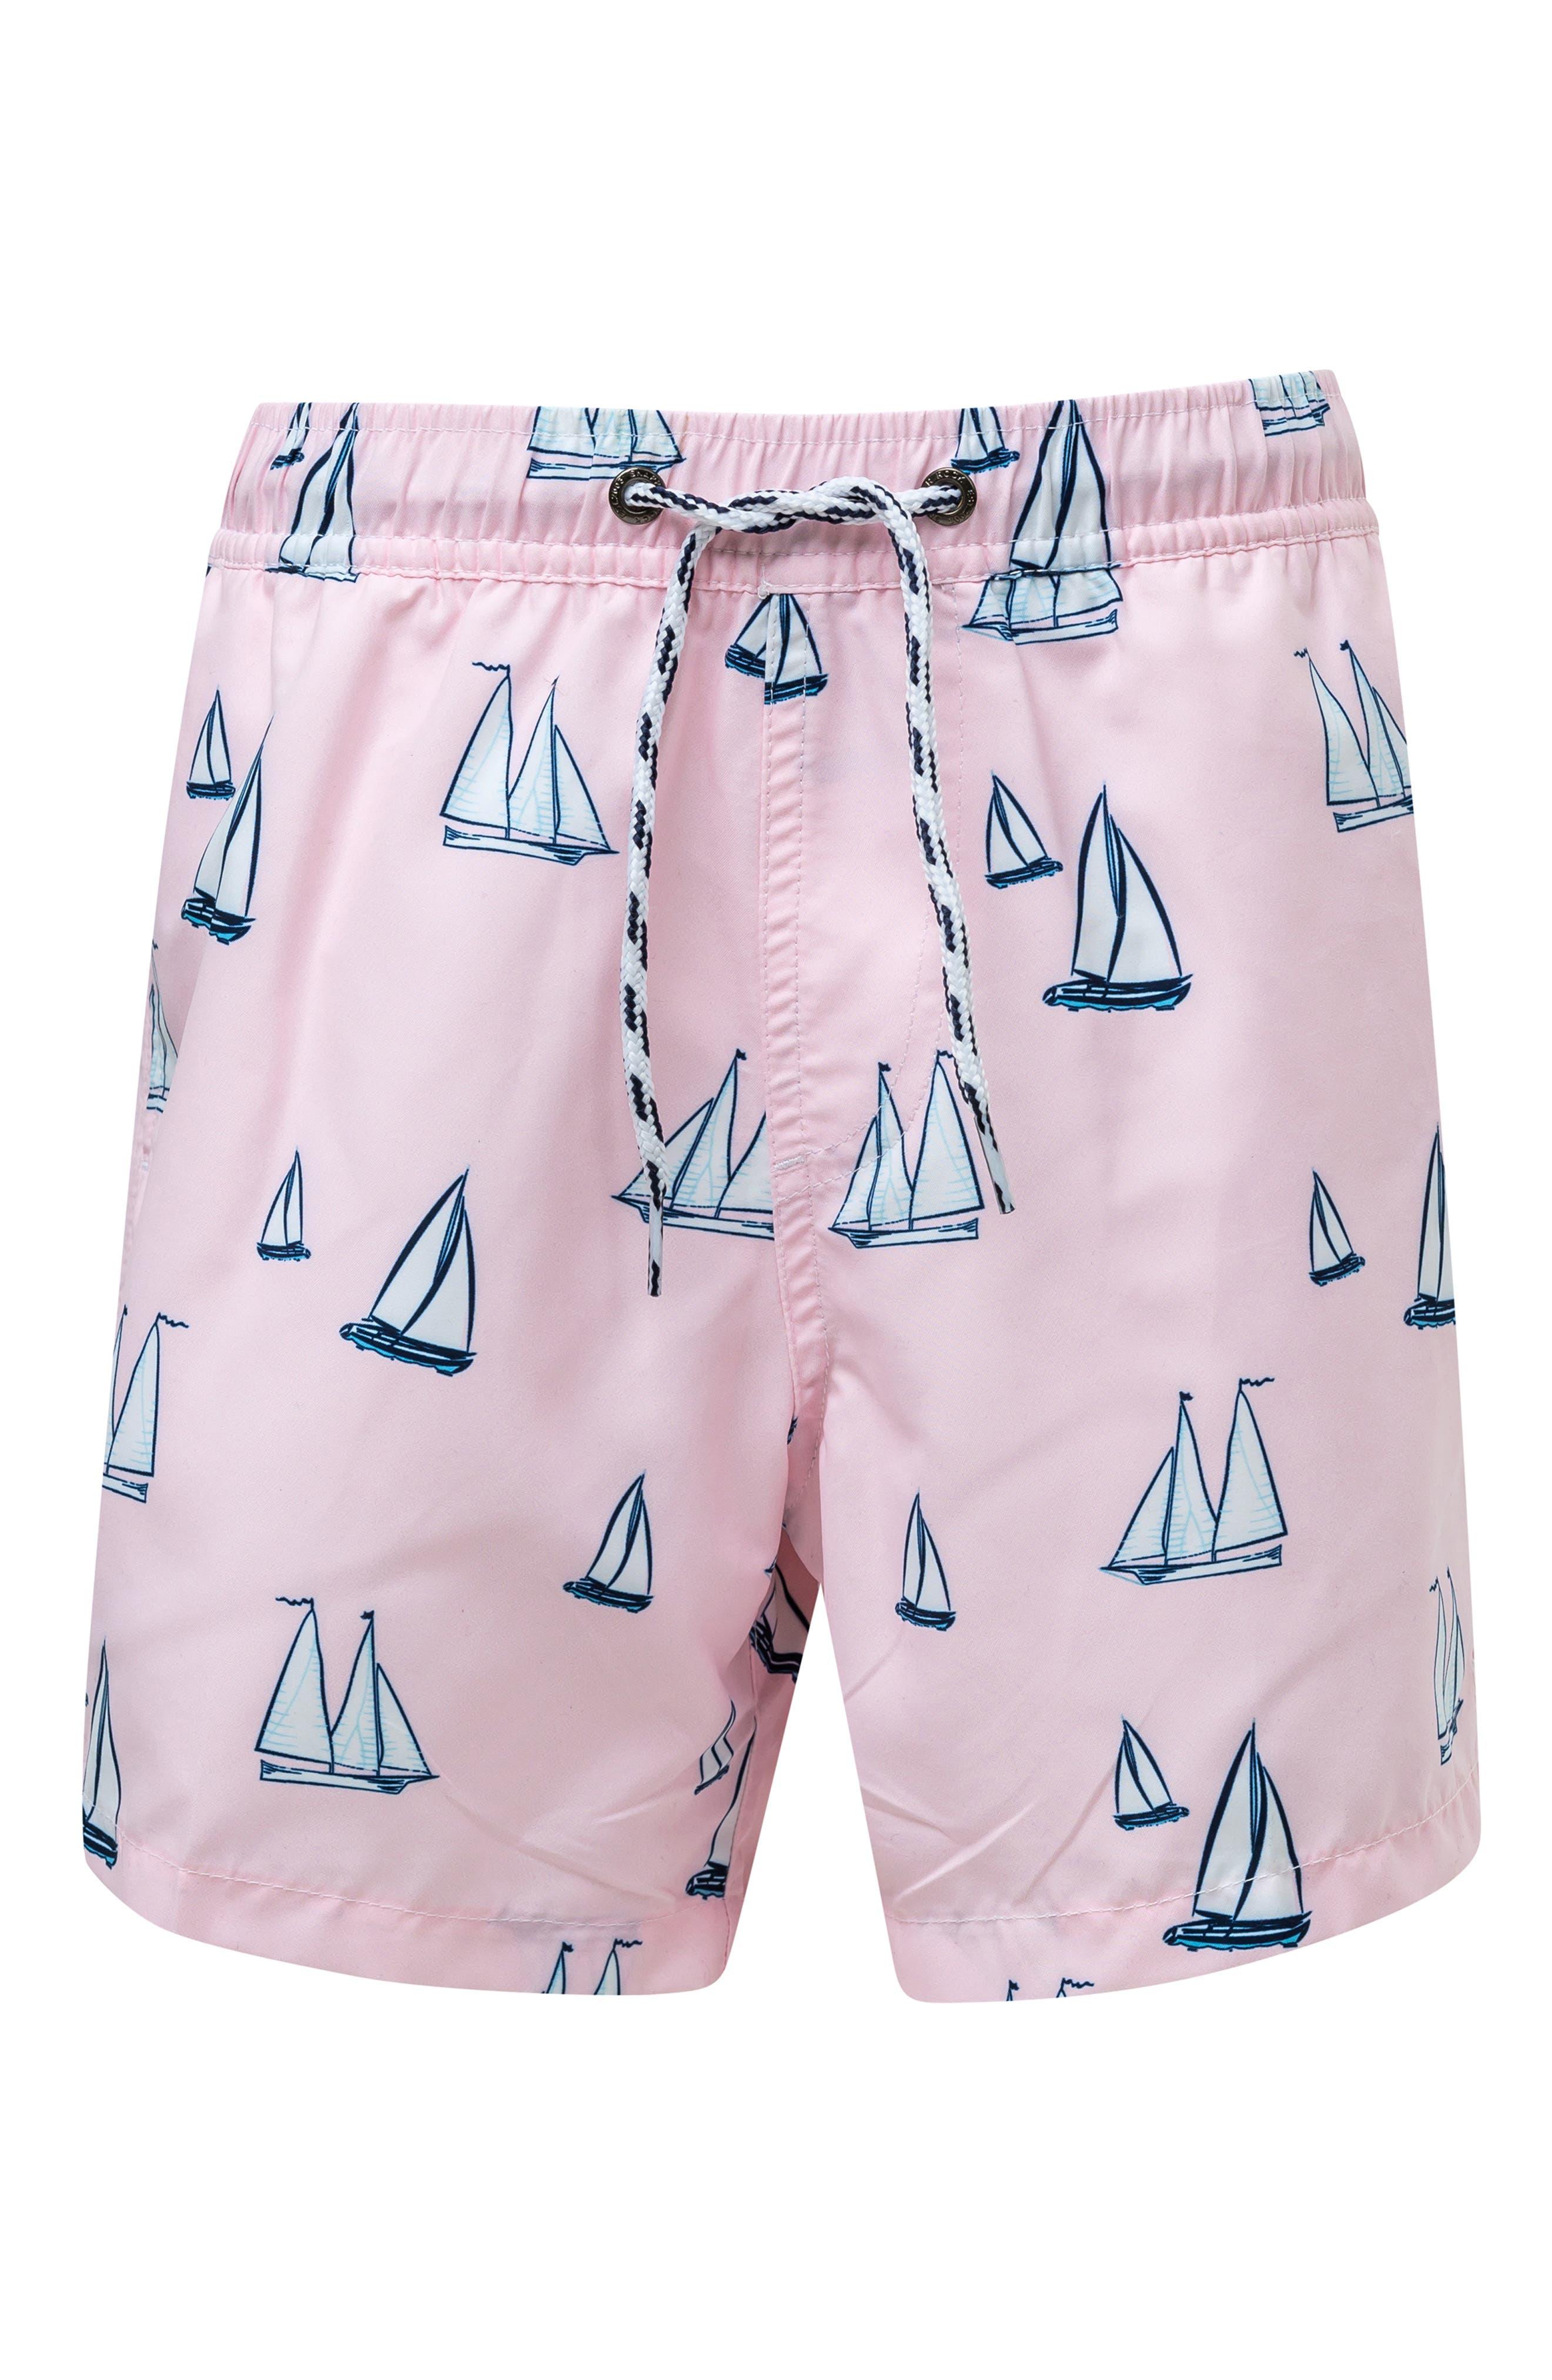 Sail Away Swim Trunks, Main, color, PINK